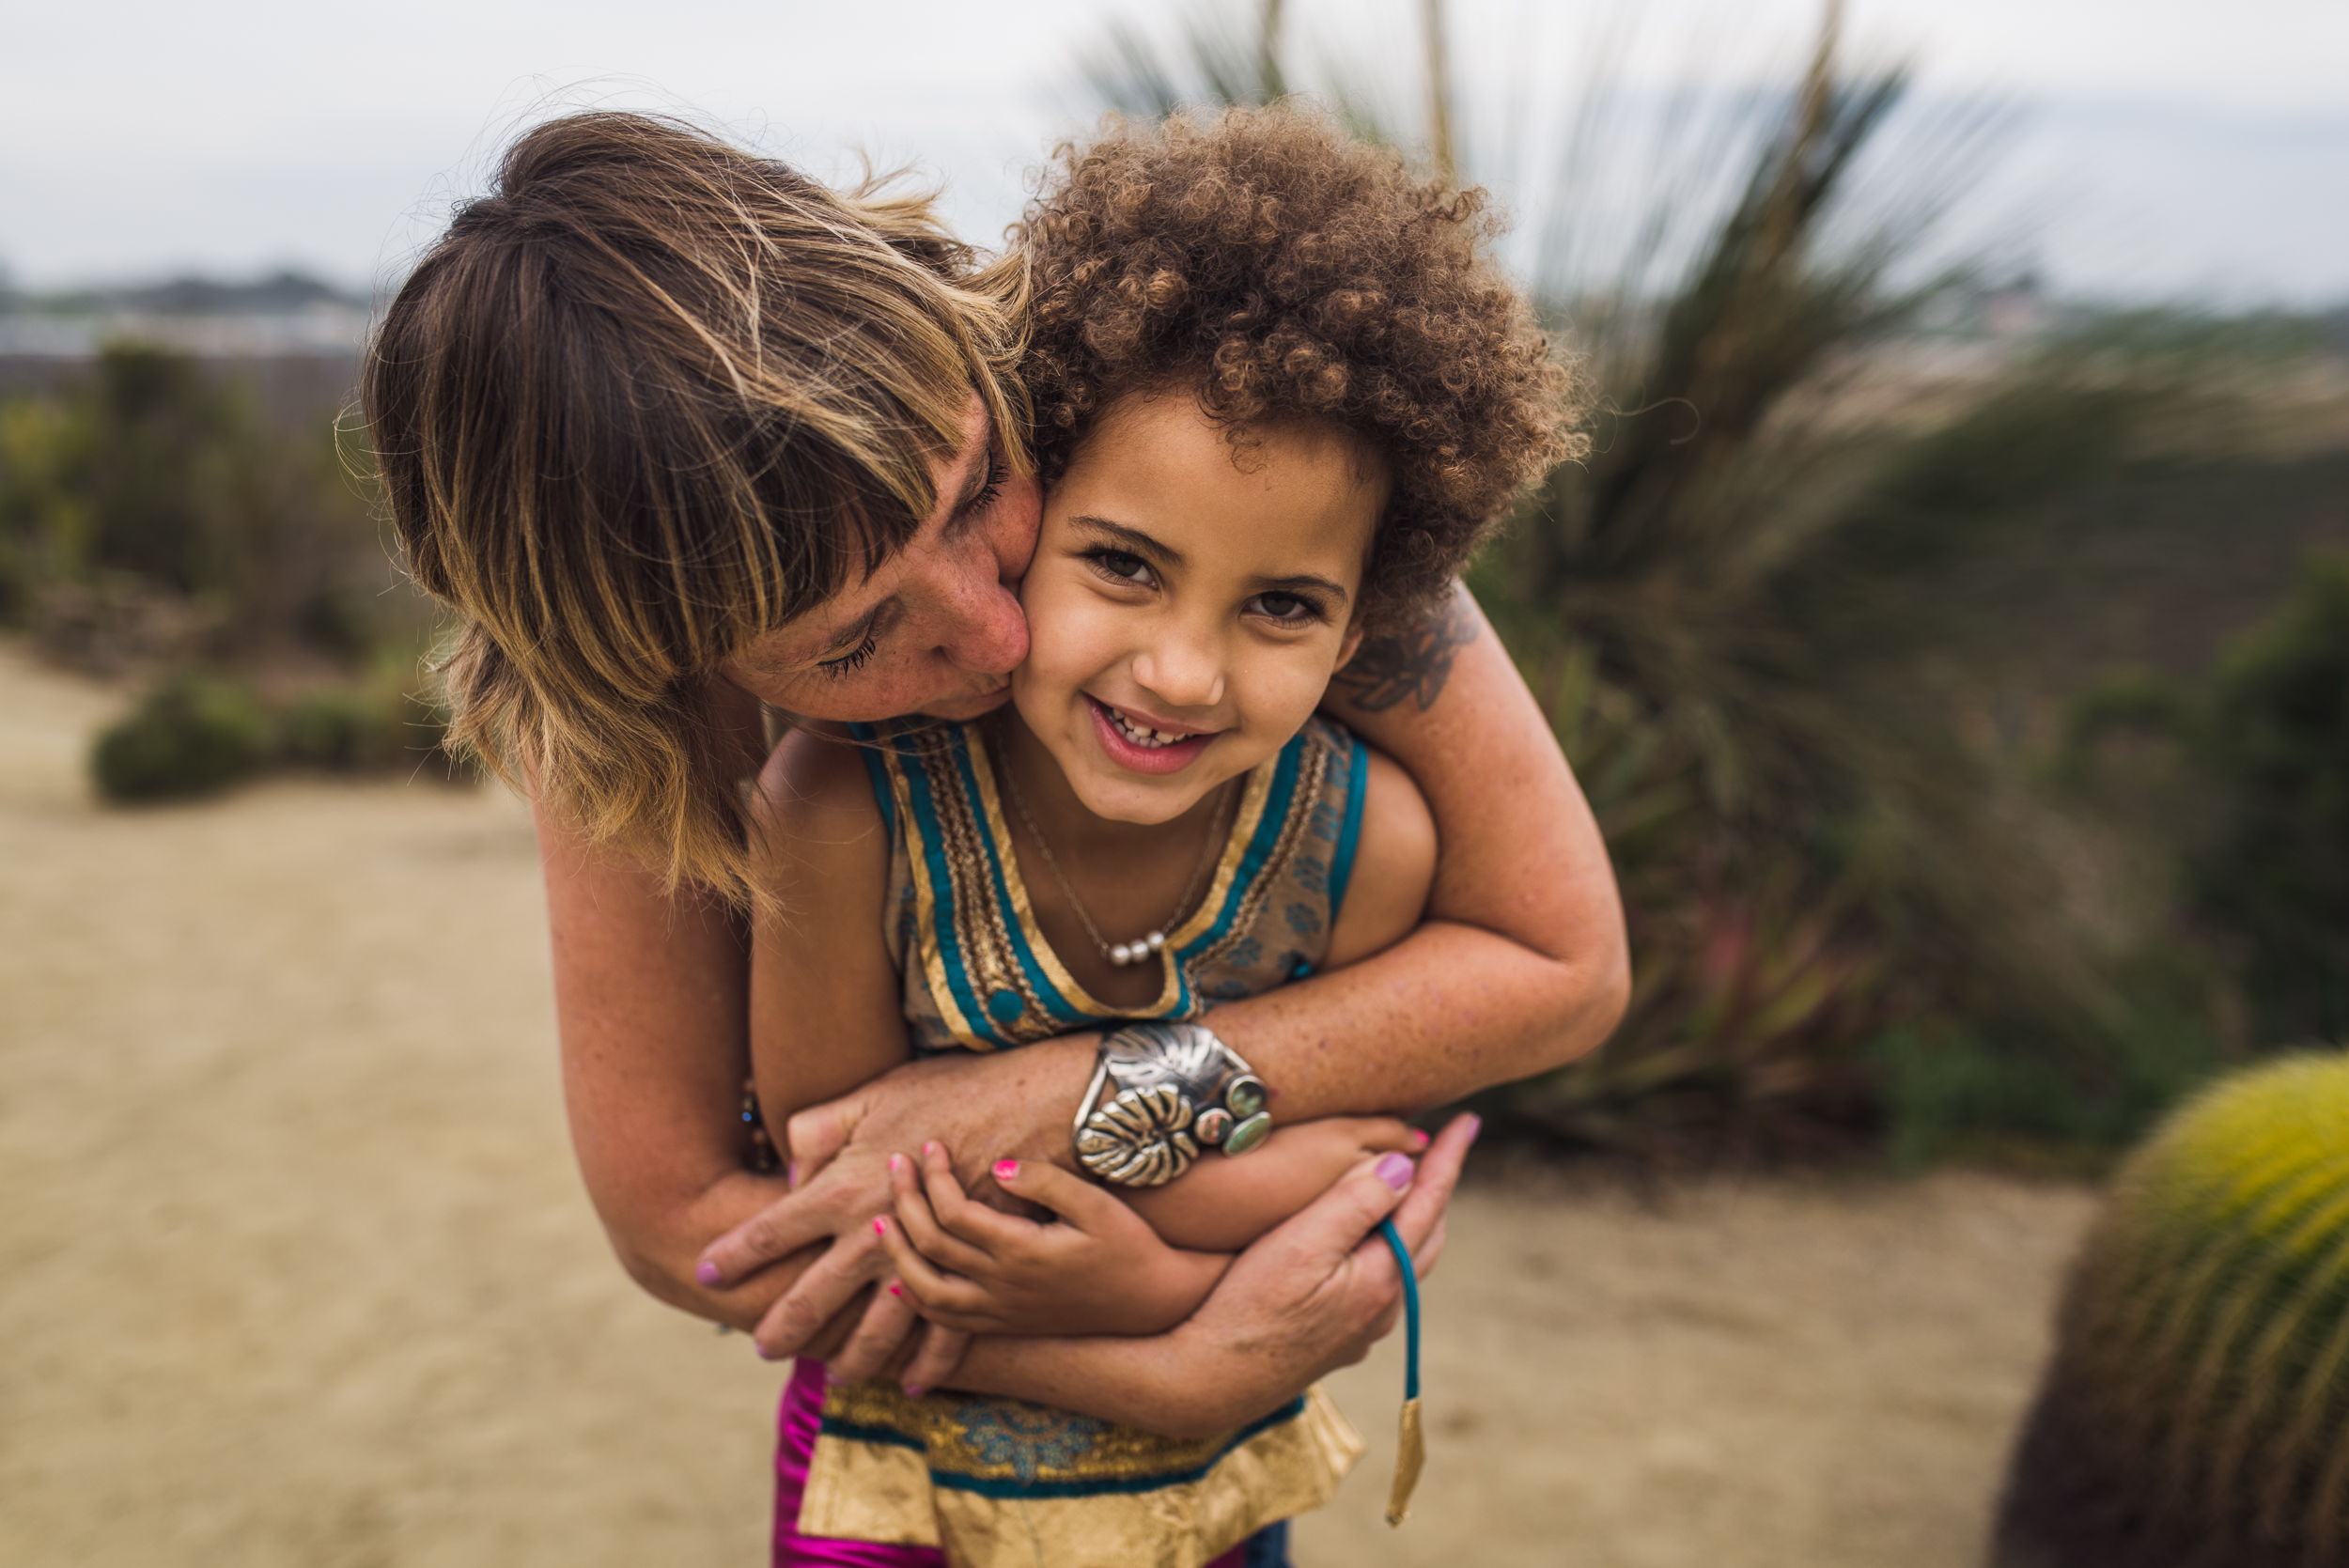 2018-San-Diego-Family-Lifestyle-Newborn-Travel-Vacation-Photographer-Kelsey-Smith-Photography-Coronado-La-Jolla-Encinitas-Solana-Beach-Del-Mar-45.jpg